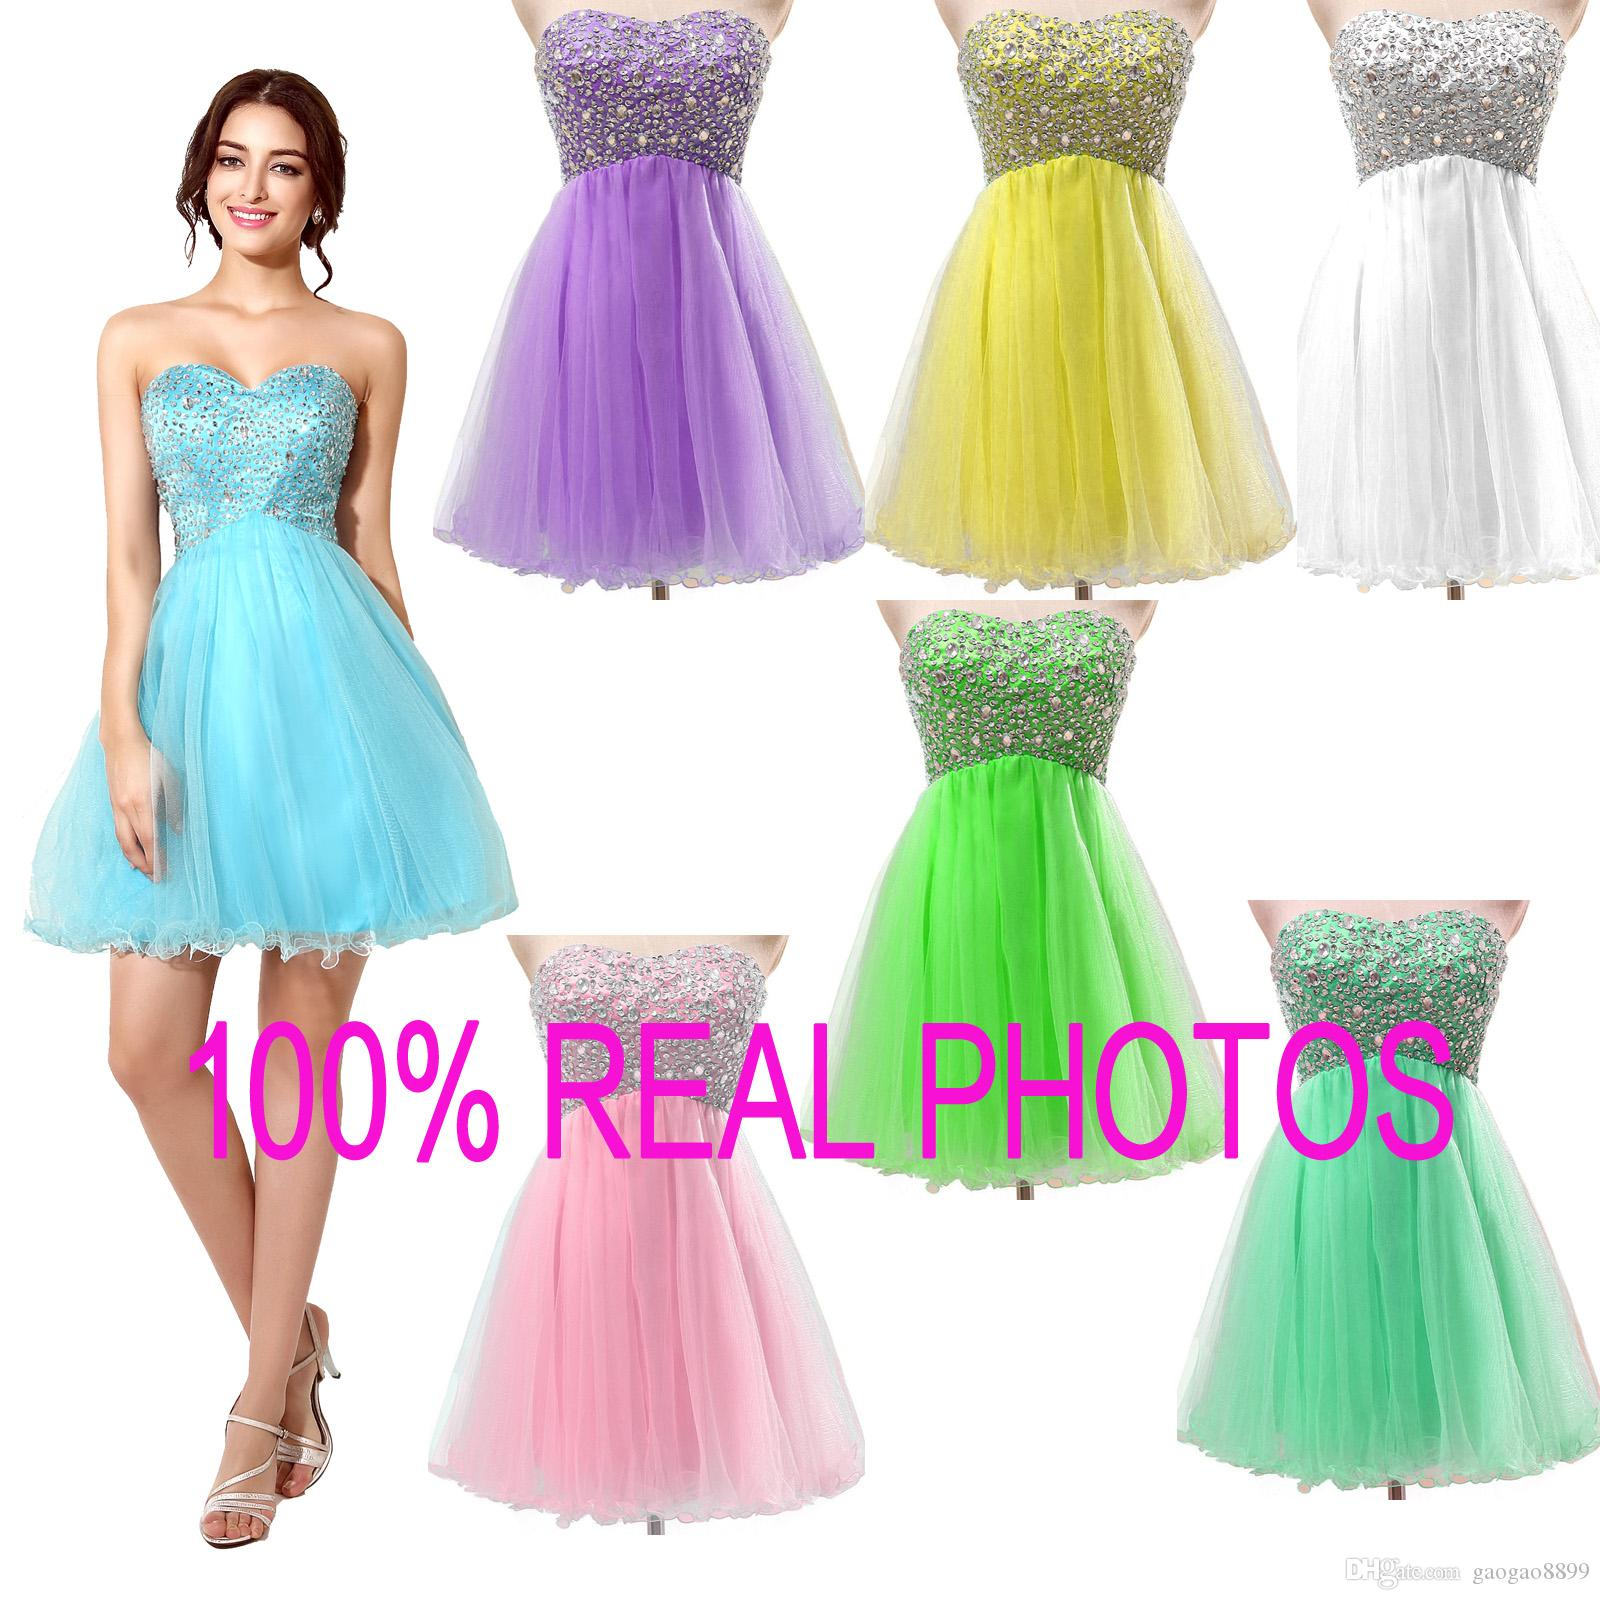 2019 Sweetheart Beads 홈 커밍 드레스 Tulle Plus Size 섹시한 민트 Sky Blue 라인 A 짧은 파티 파티 졸업 칵테일 가운 실제 이미지